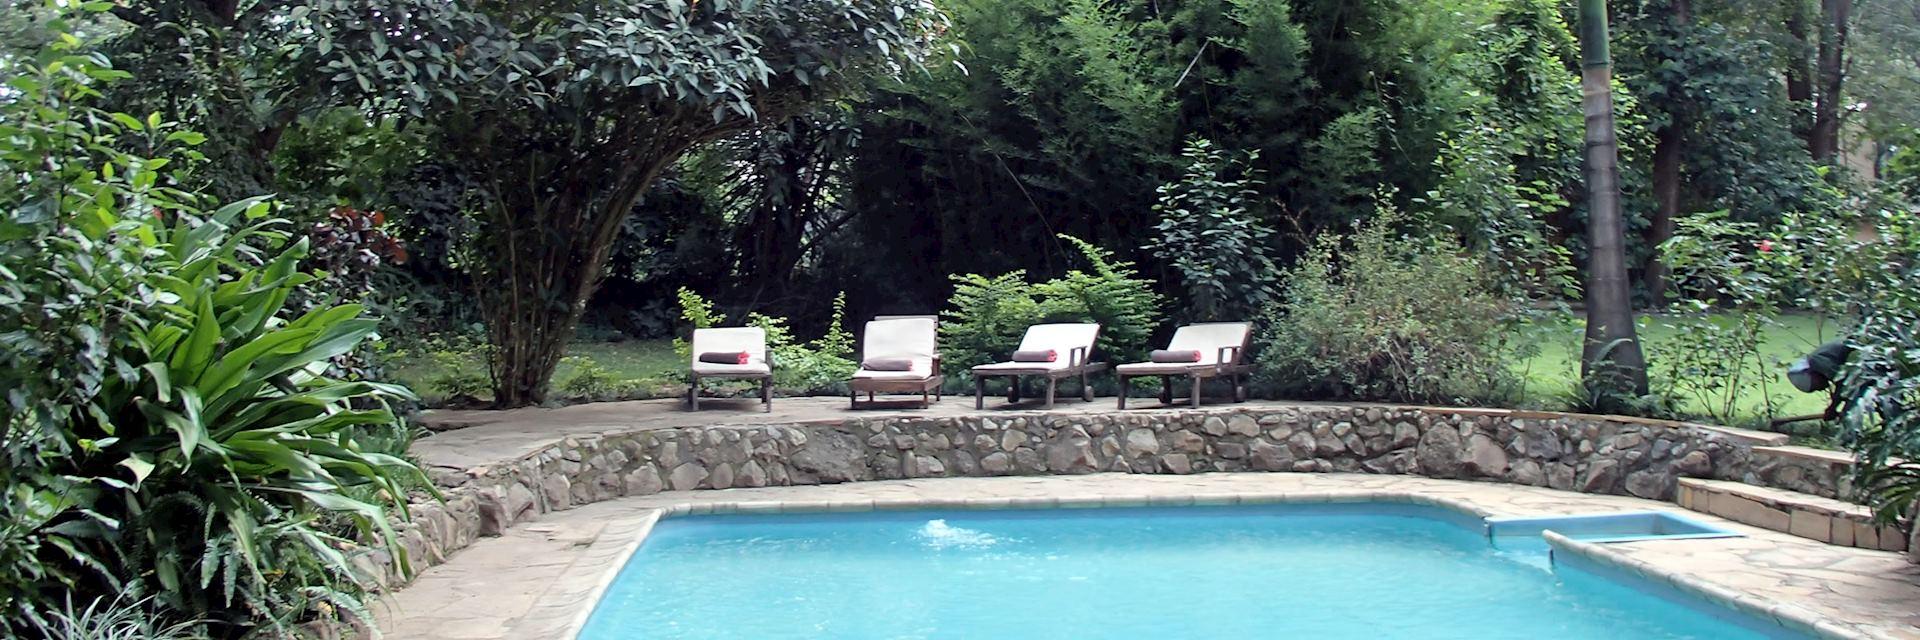 Rivertrees Lodge